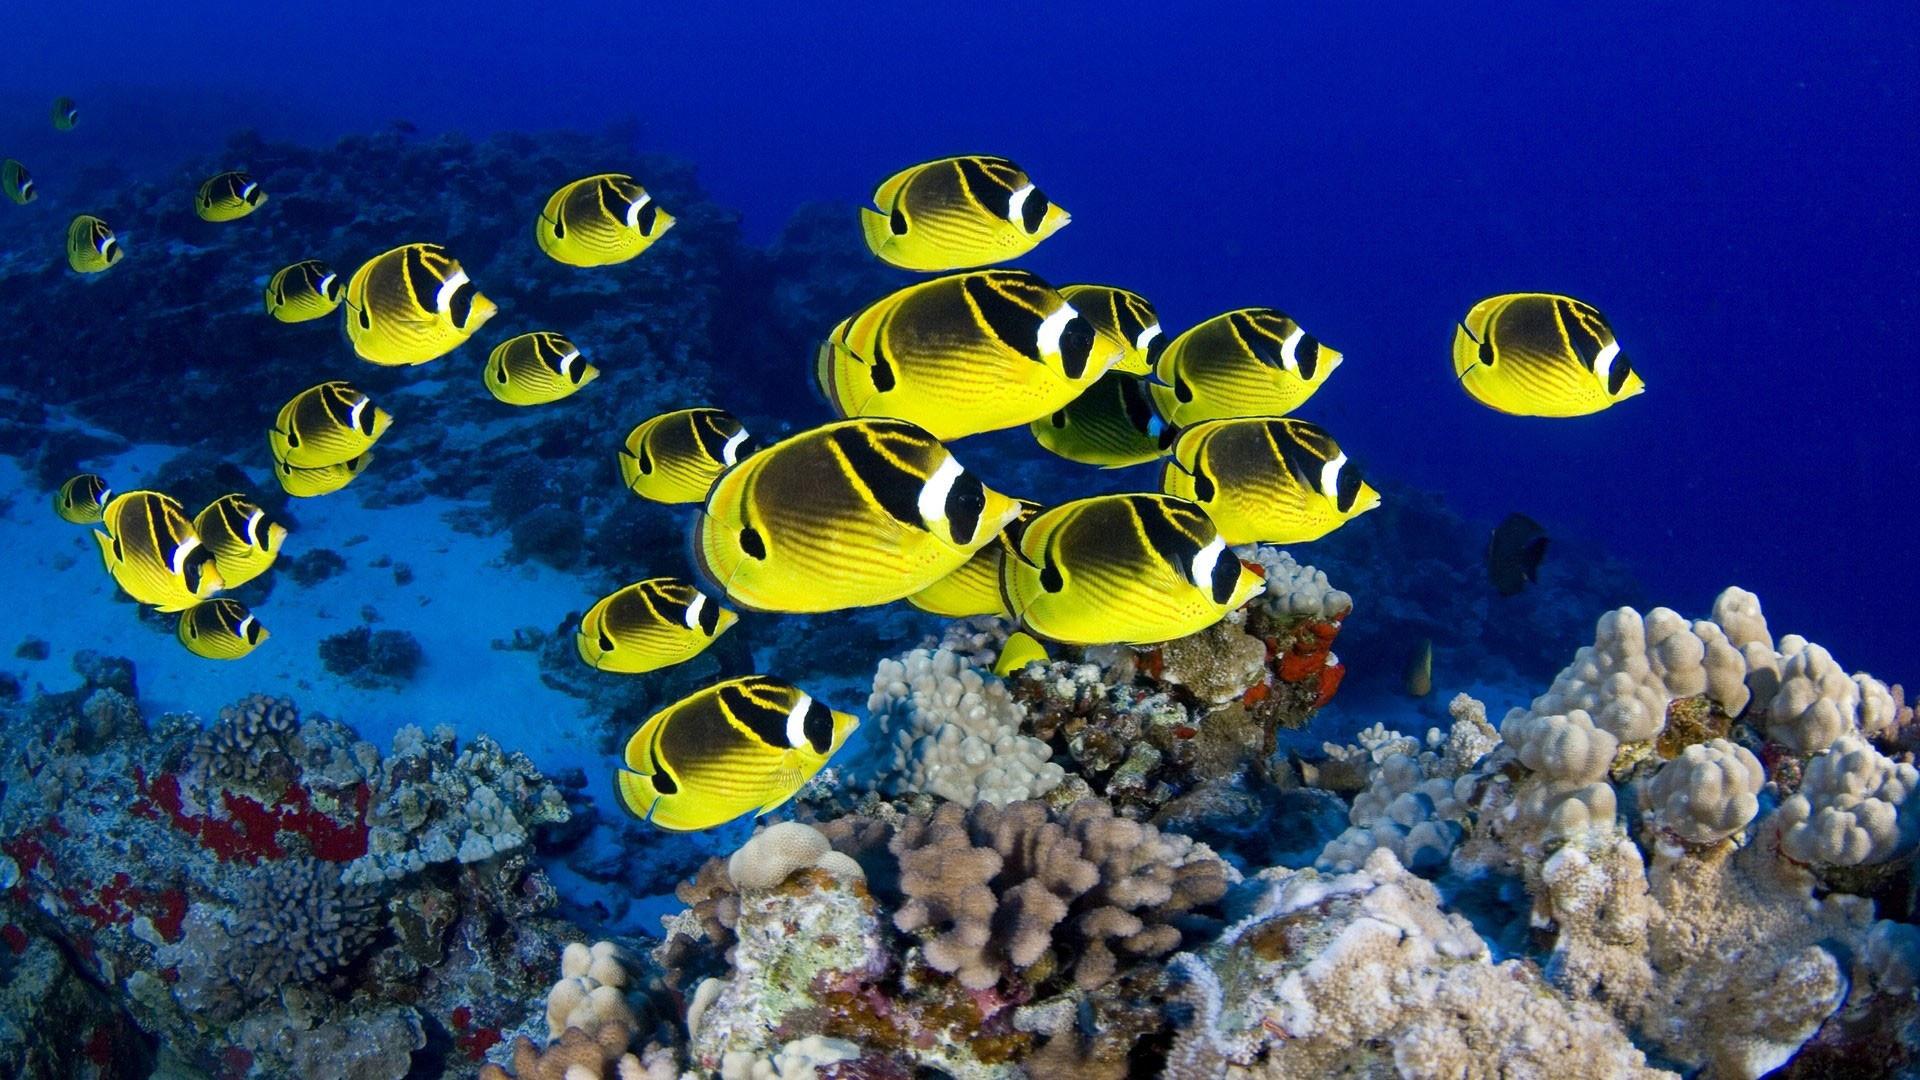 hd pics photos fish yellow marine sea desktop background wallpaper